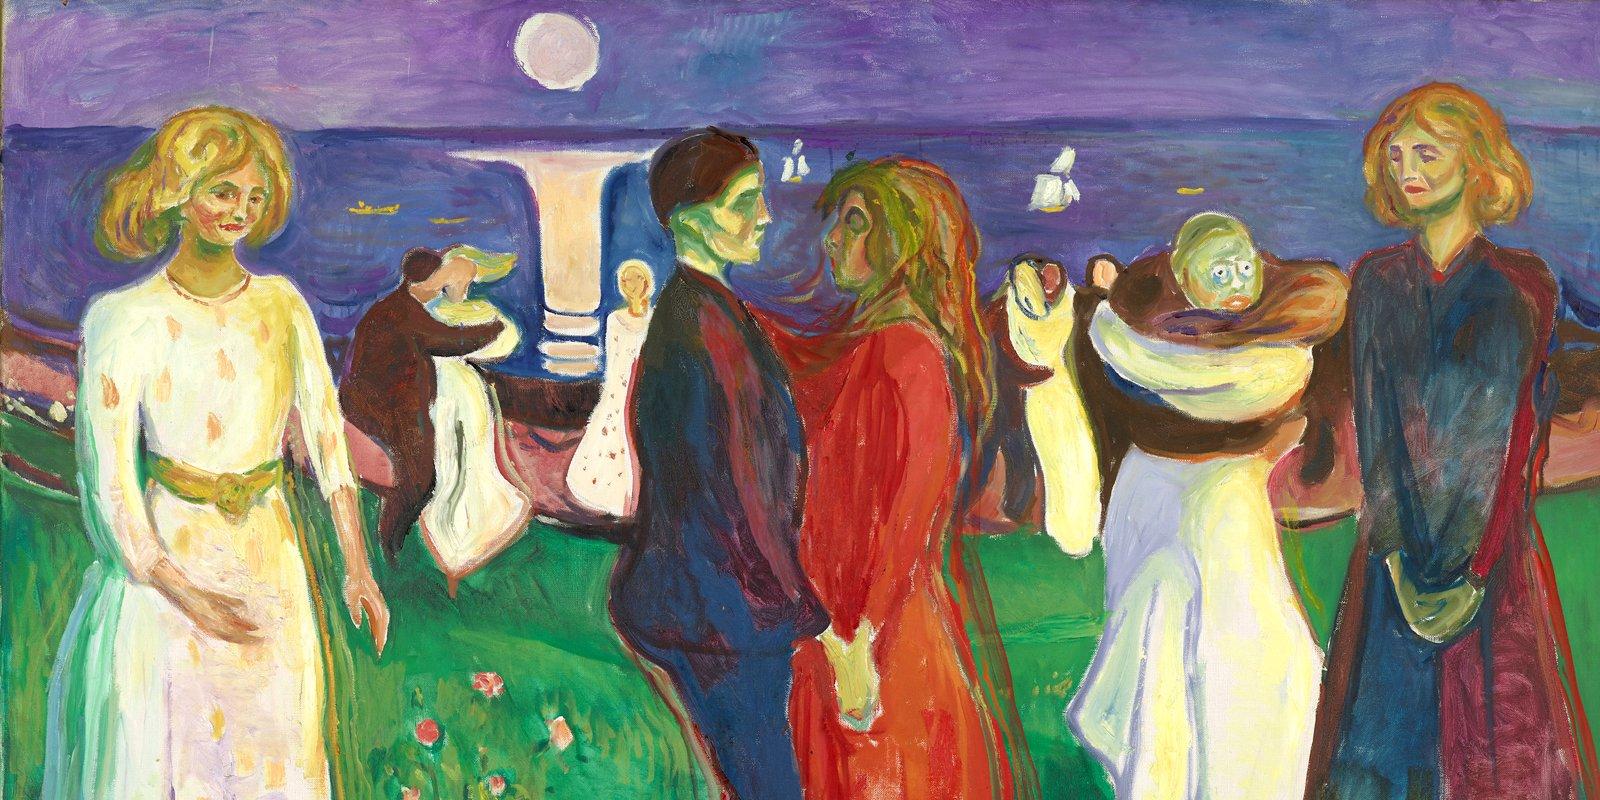 Э. Мунк. Танец жизни. 1925 год